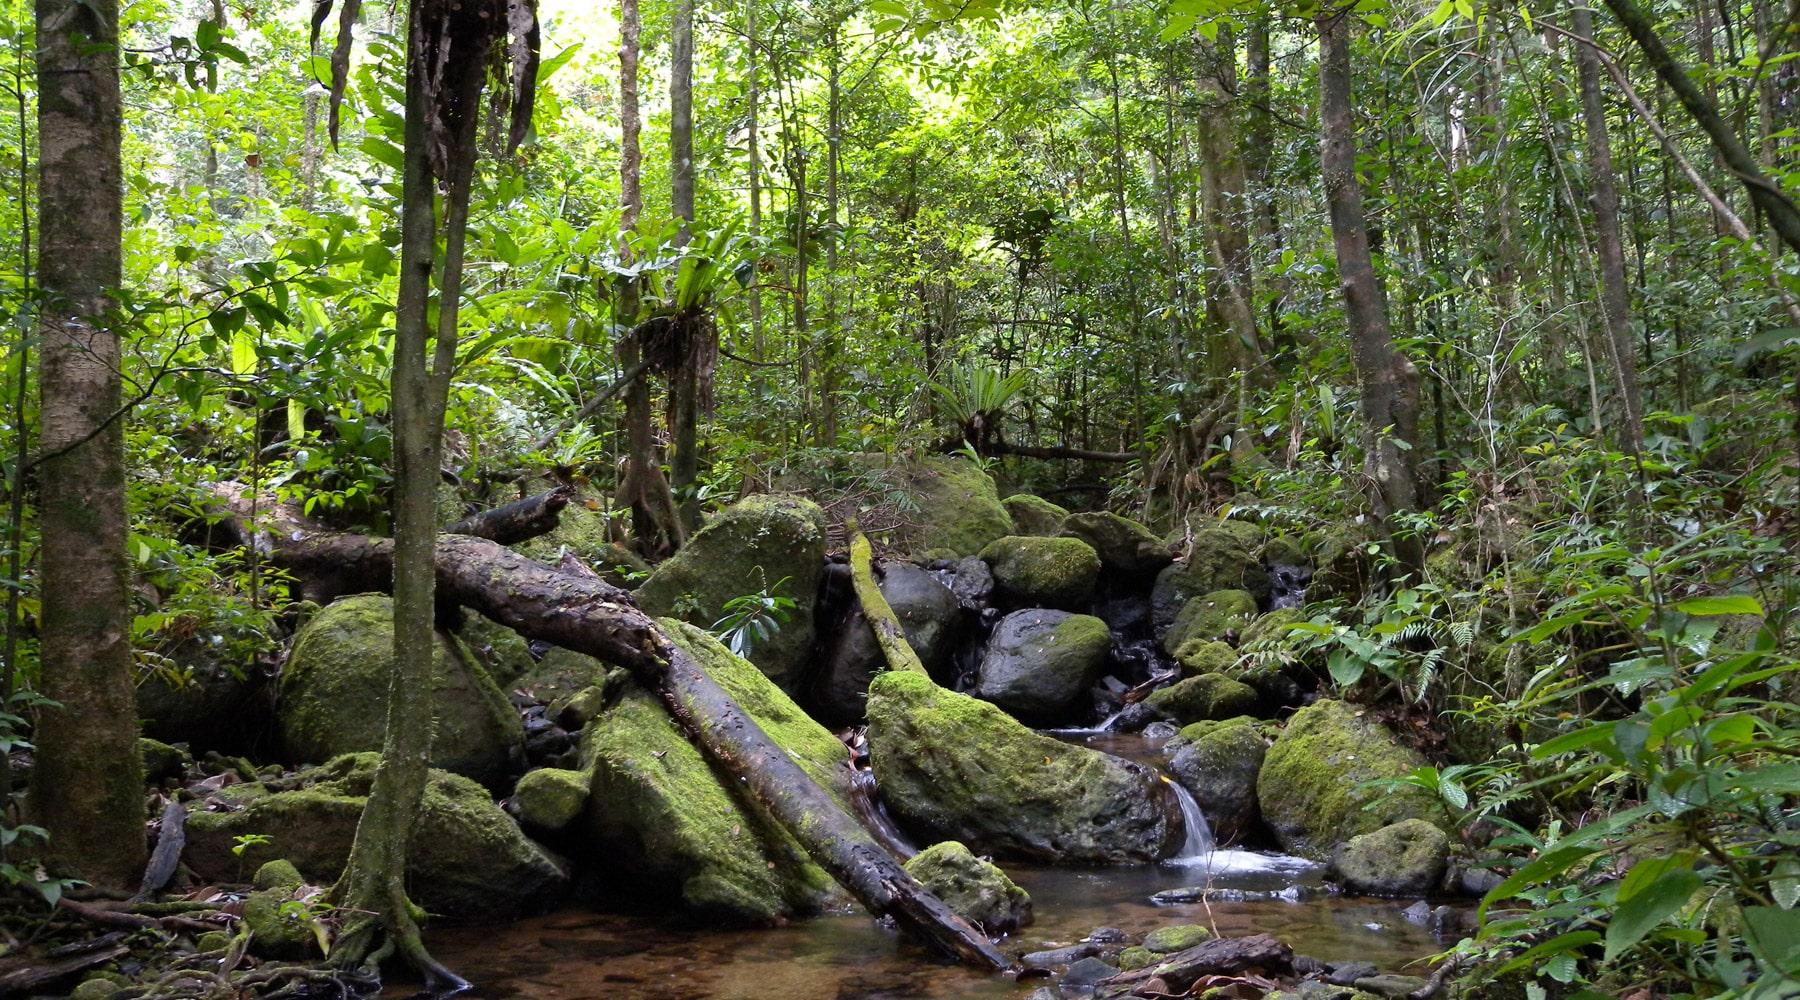 Masoala National Park in Madagascar – Tips & Guide